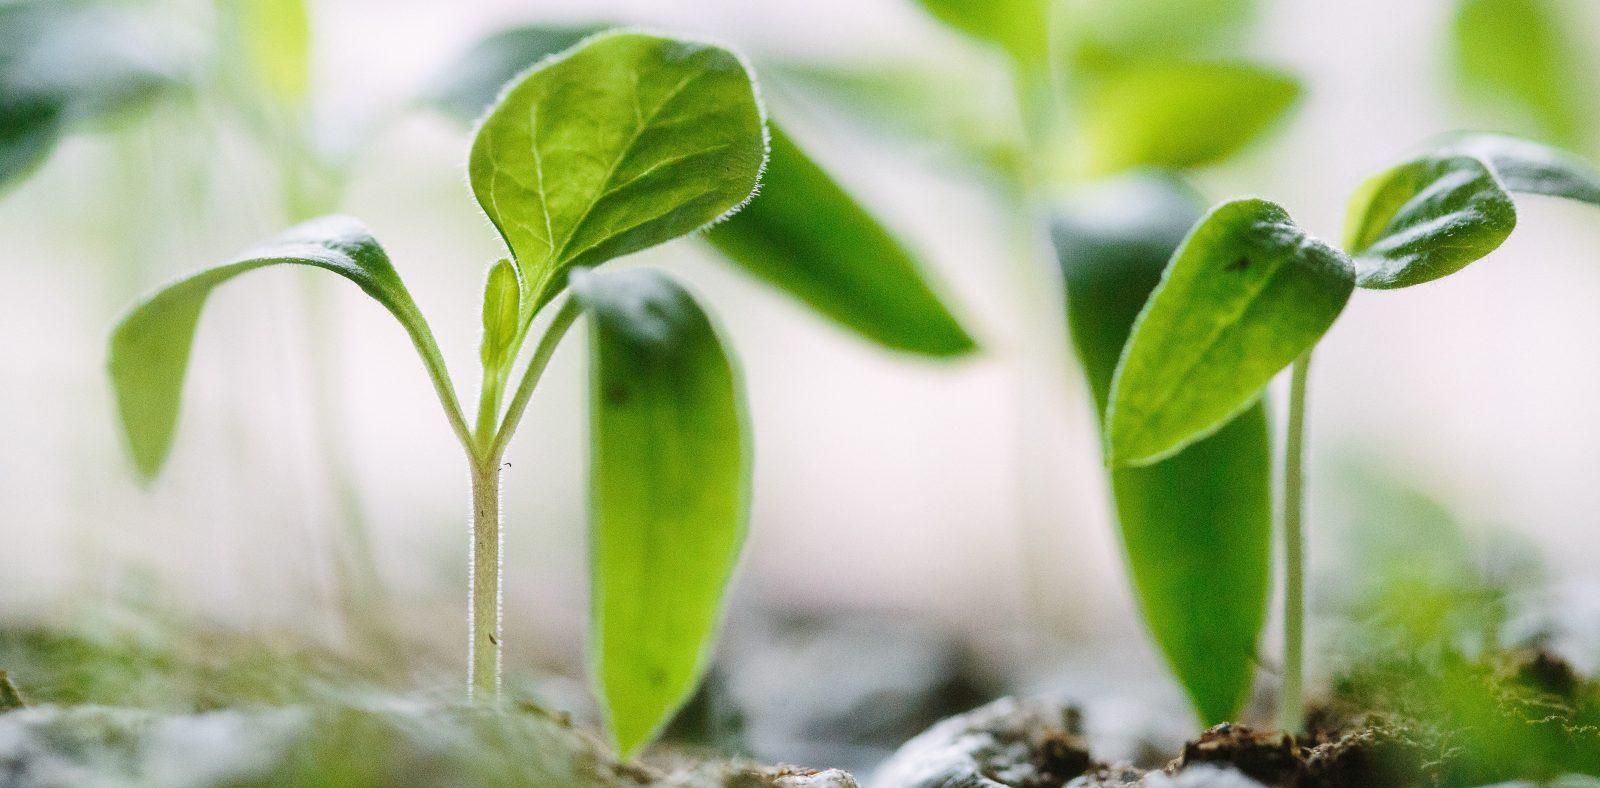 Hållbarhetsprogram